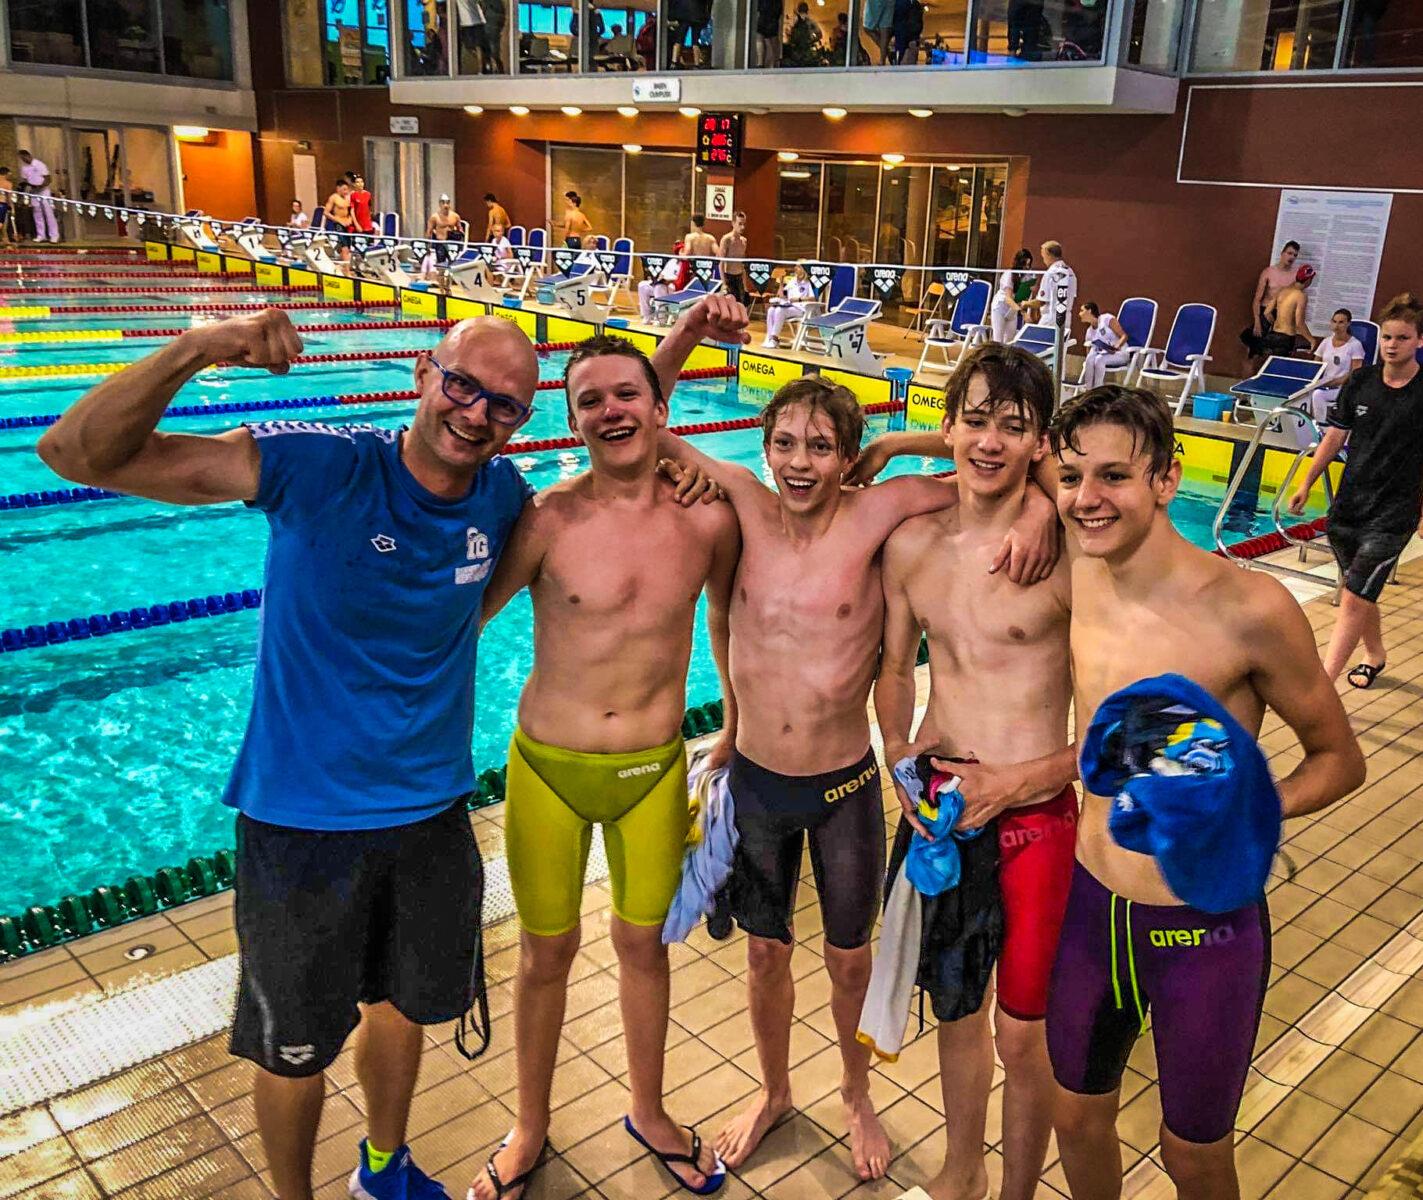 Trener z czterema zawodnikami na tle basenu